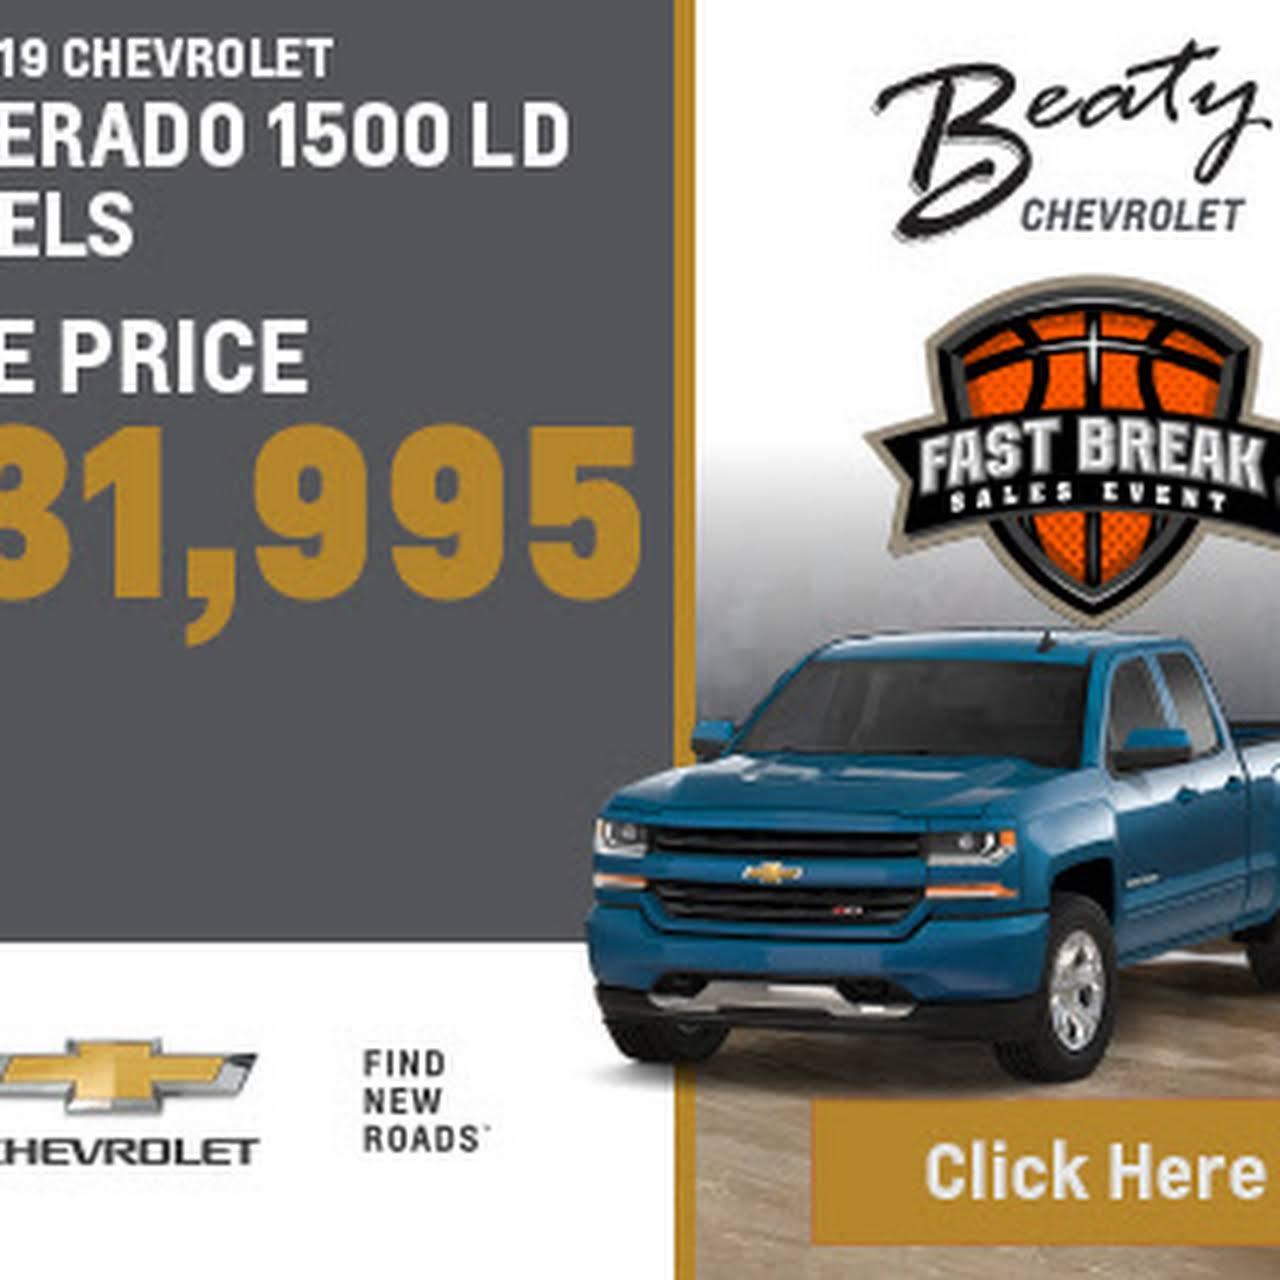 Beaty Chevrolet Chevrolet Dealer In Knoxville